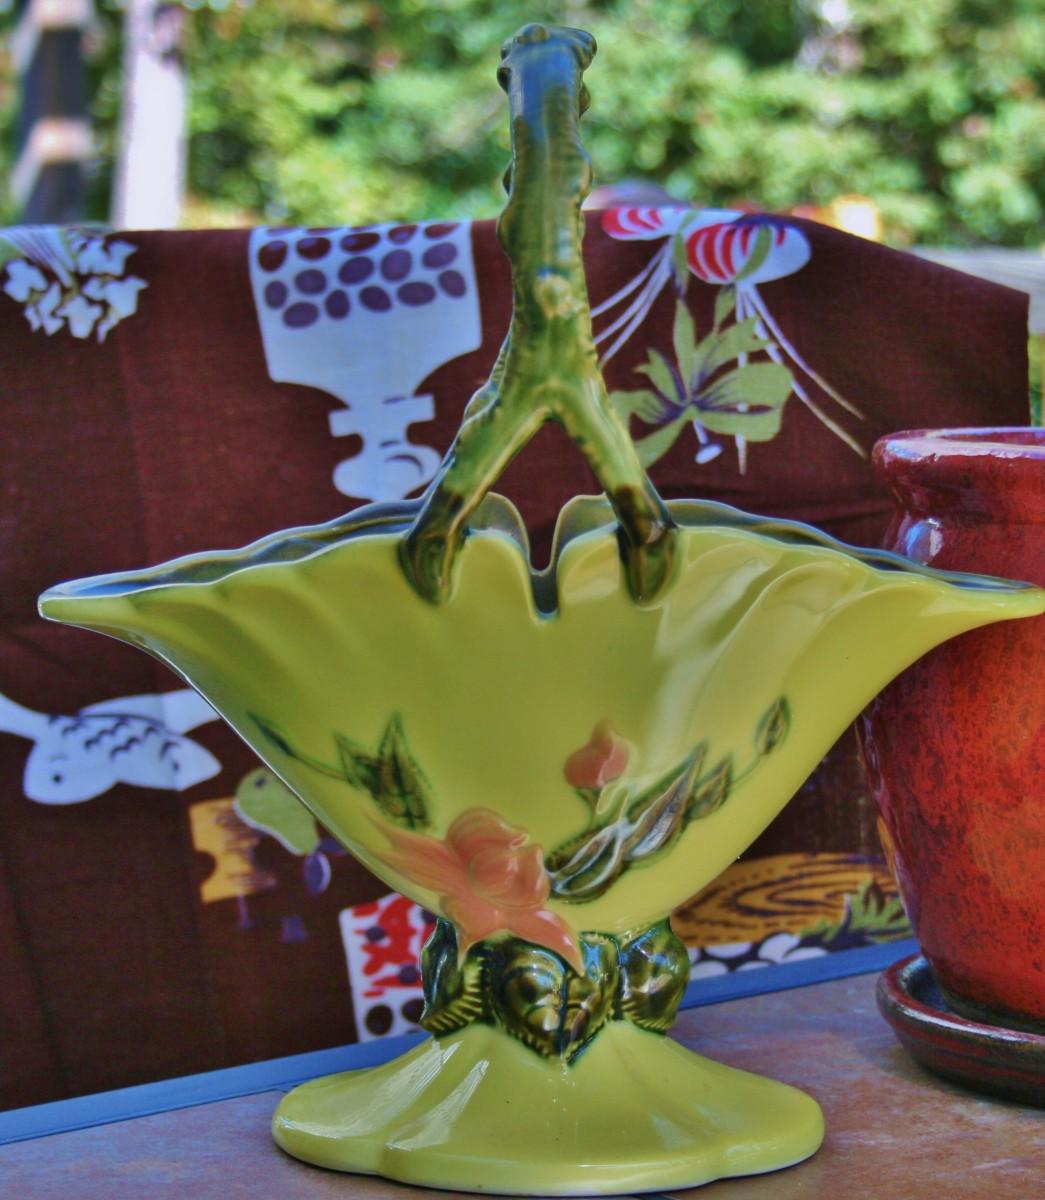 Hull Woodland basket vase/jardinière with faux branch handle and flower design on both sides.